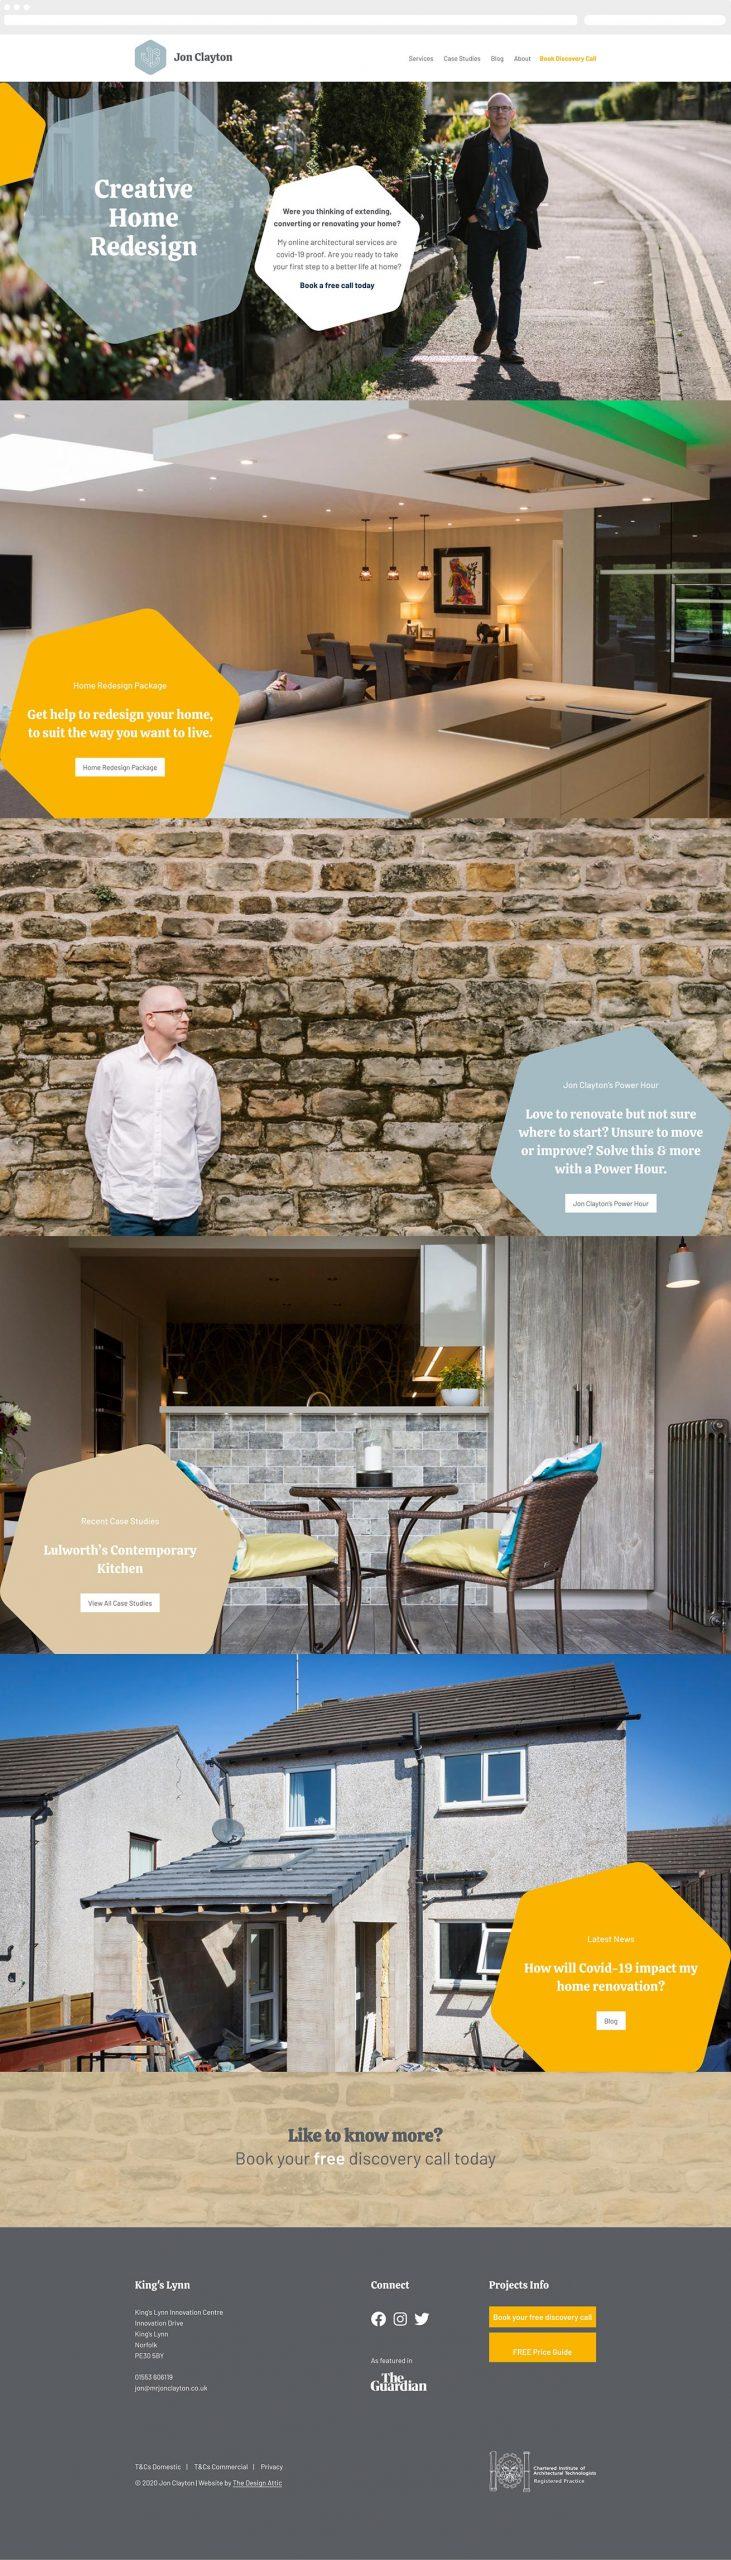 Personal brand identity for residential architect Jon Clayton | The Design Attic